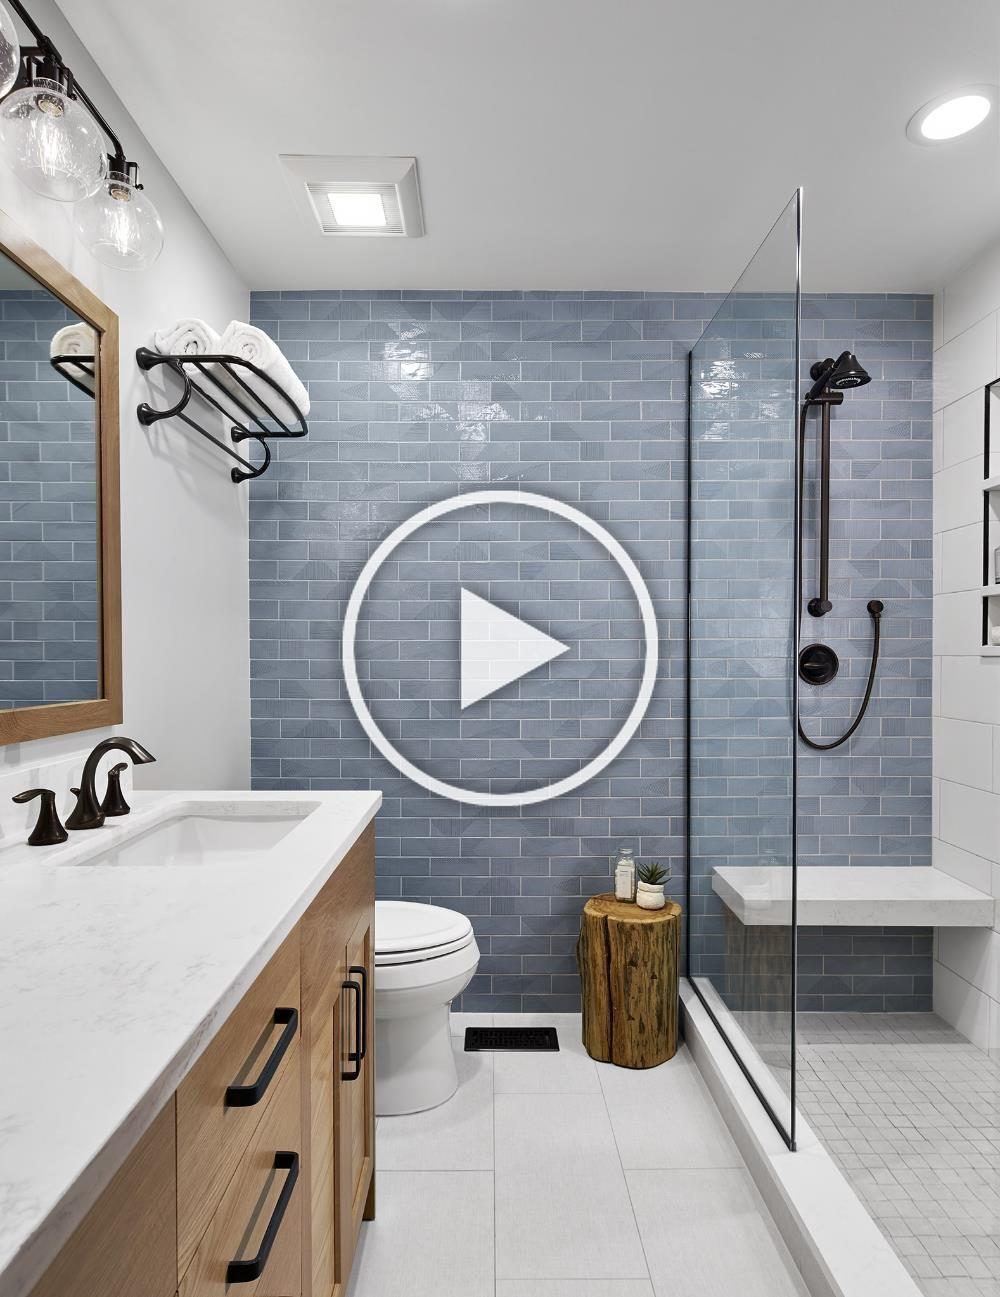 Bathroom Portfolio Chicago Interior Designers Lugbill Designs Bathroom Interior Design Bathroom Interior Bathroom Design